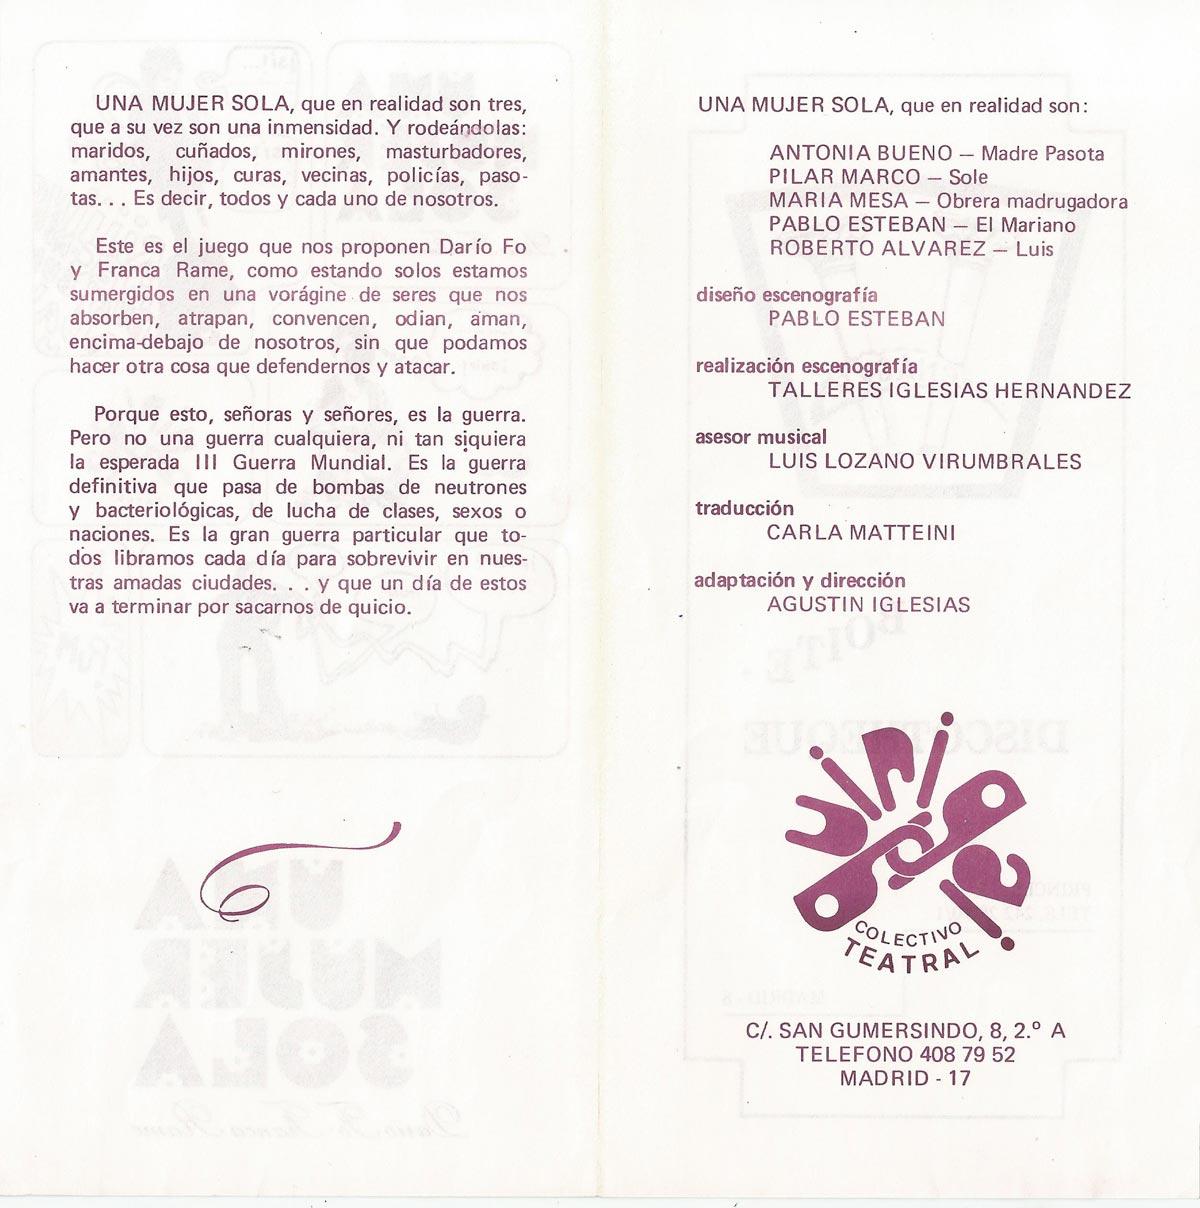 1981-Una-mujer-sola-guirigai-cartel-06